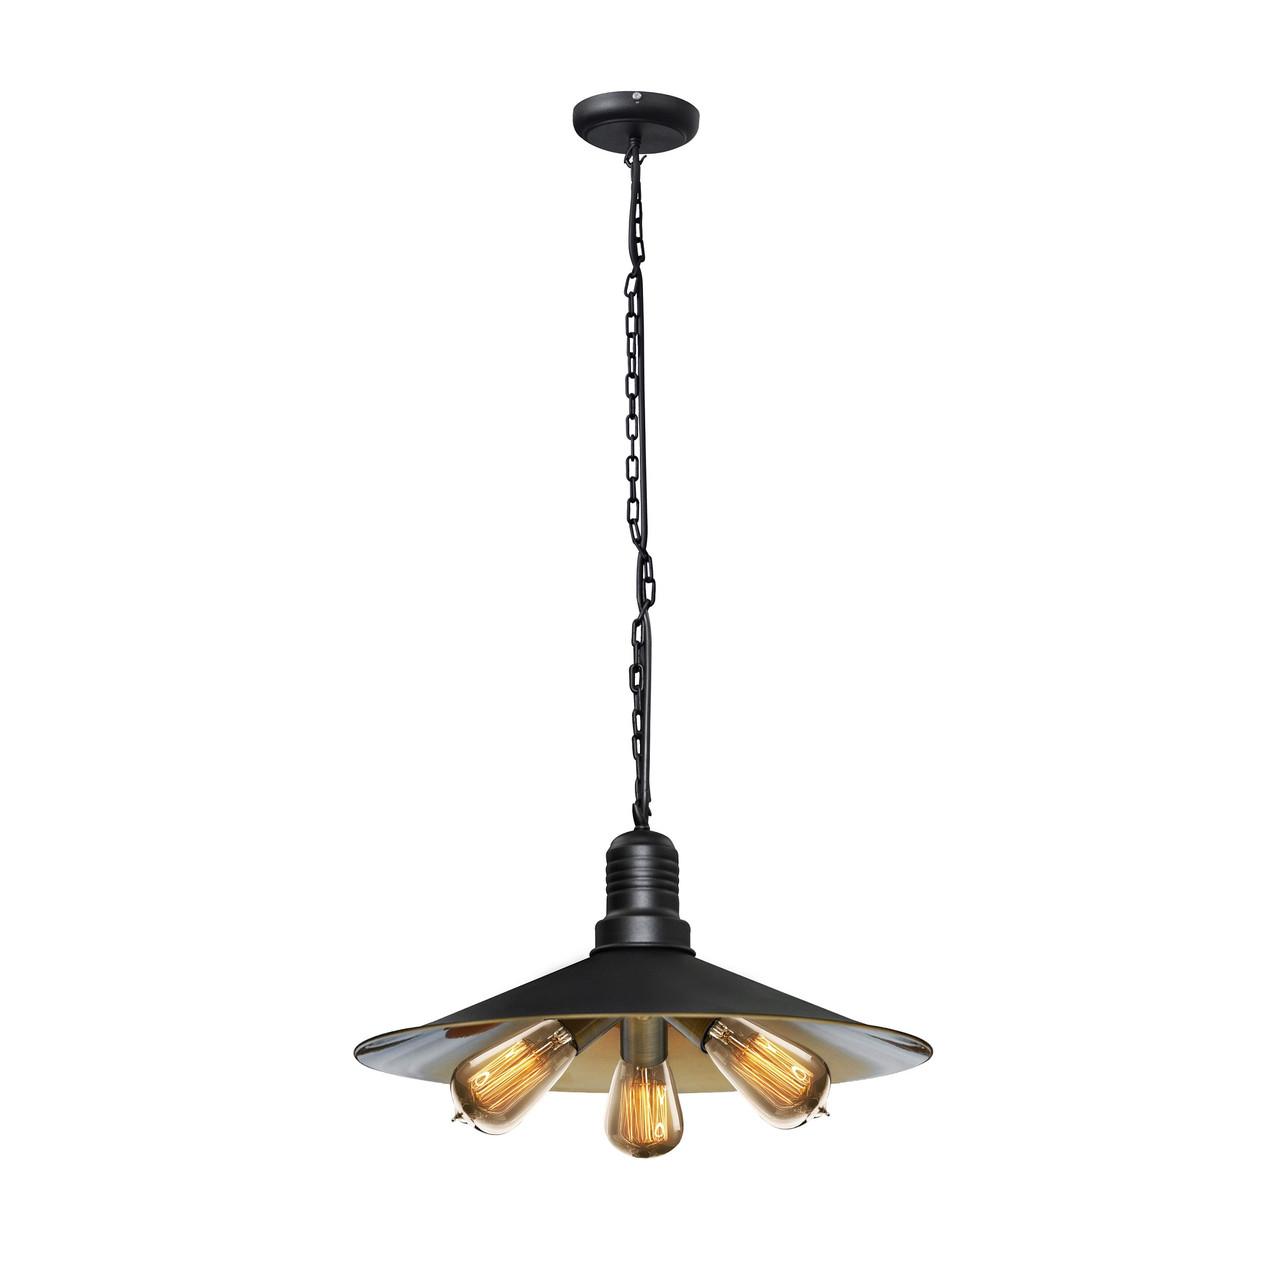 Светильник подвесной в стиле лофт на три лампы MSK Electric NL 4531